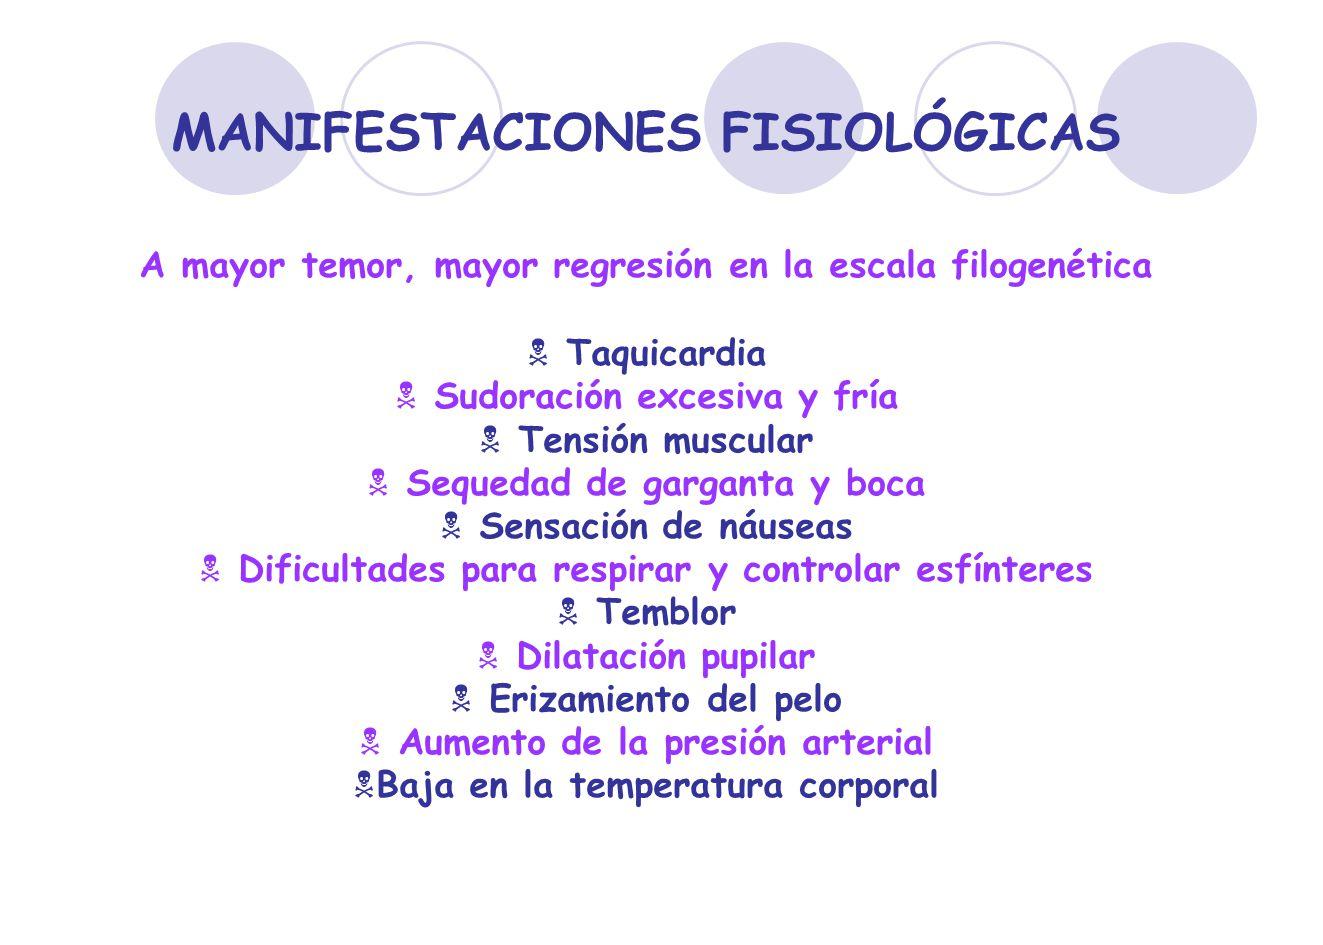 MANIFESTACIONES FISIOLÓGICAS